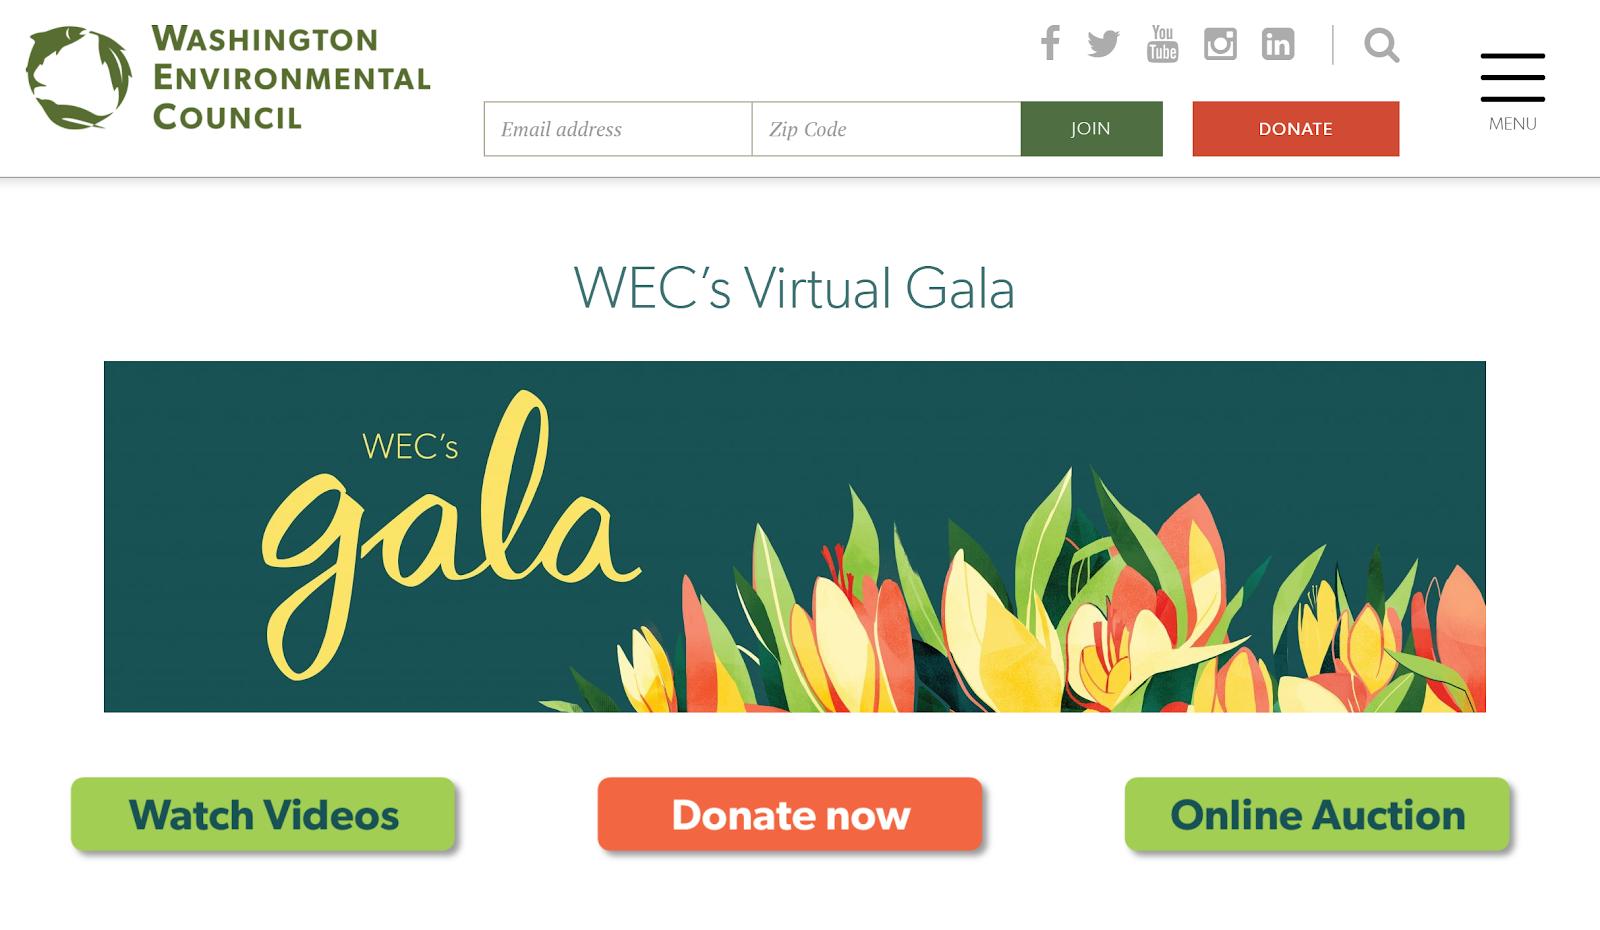 Washington Environmental Council Virtual Gala landing page